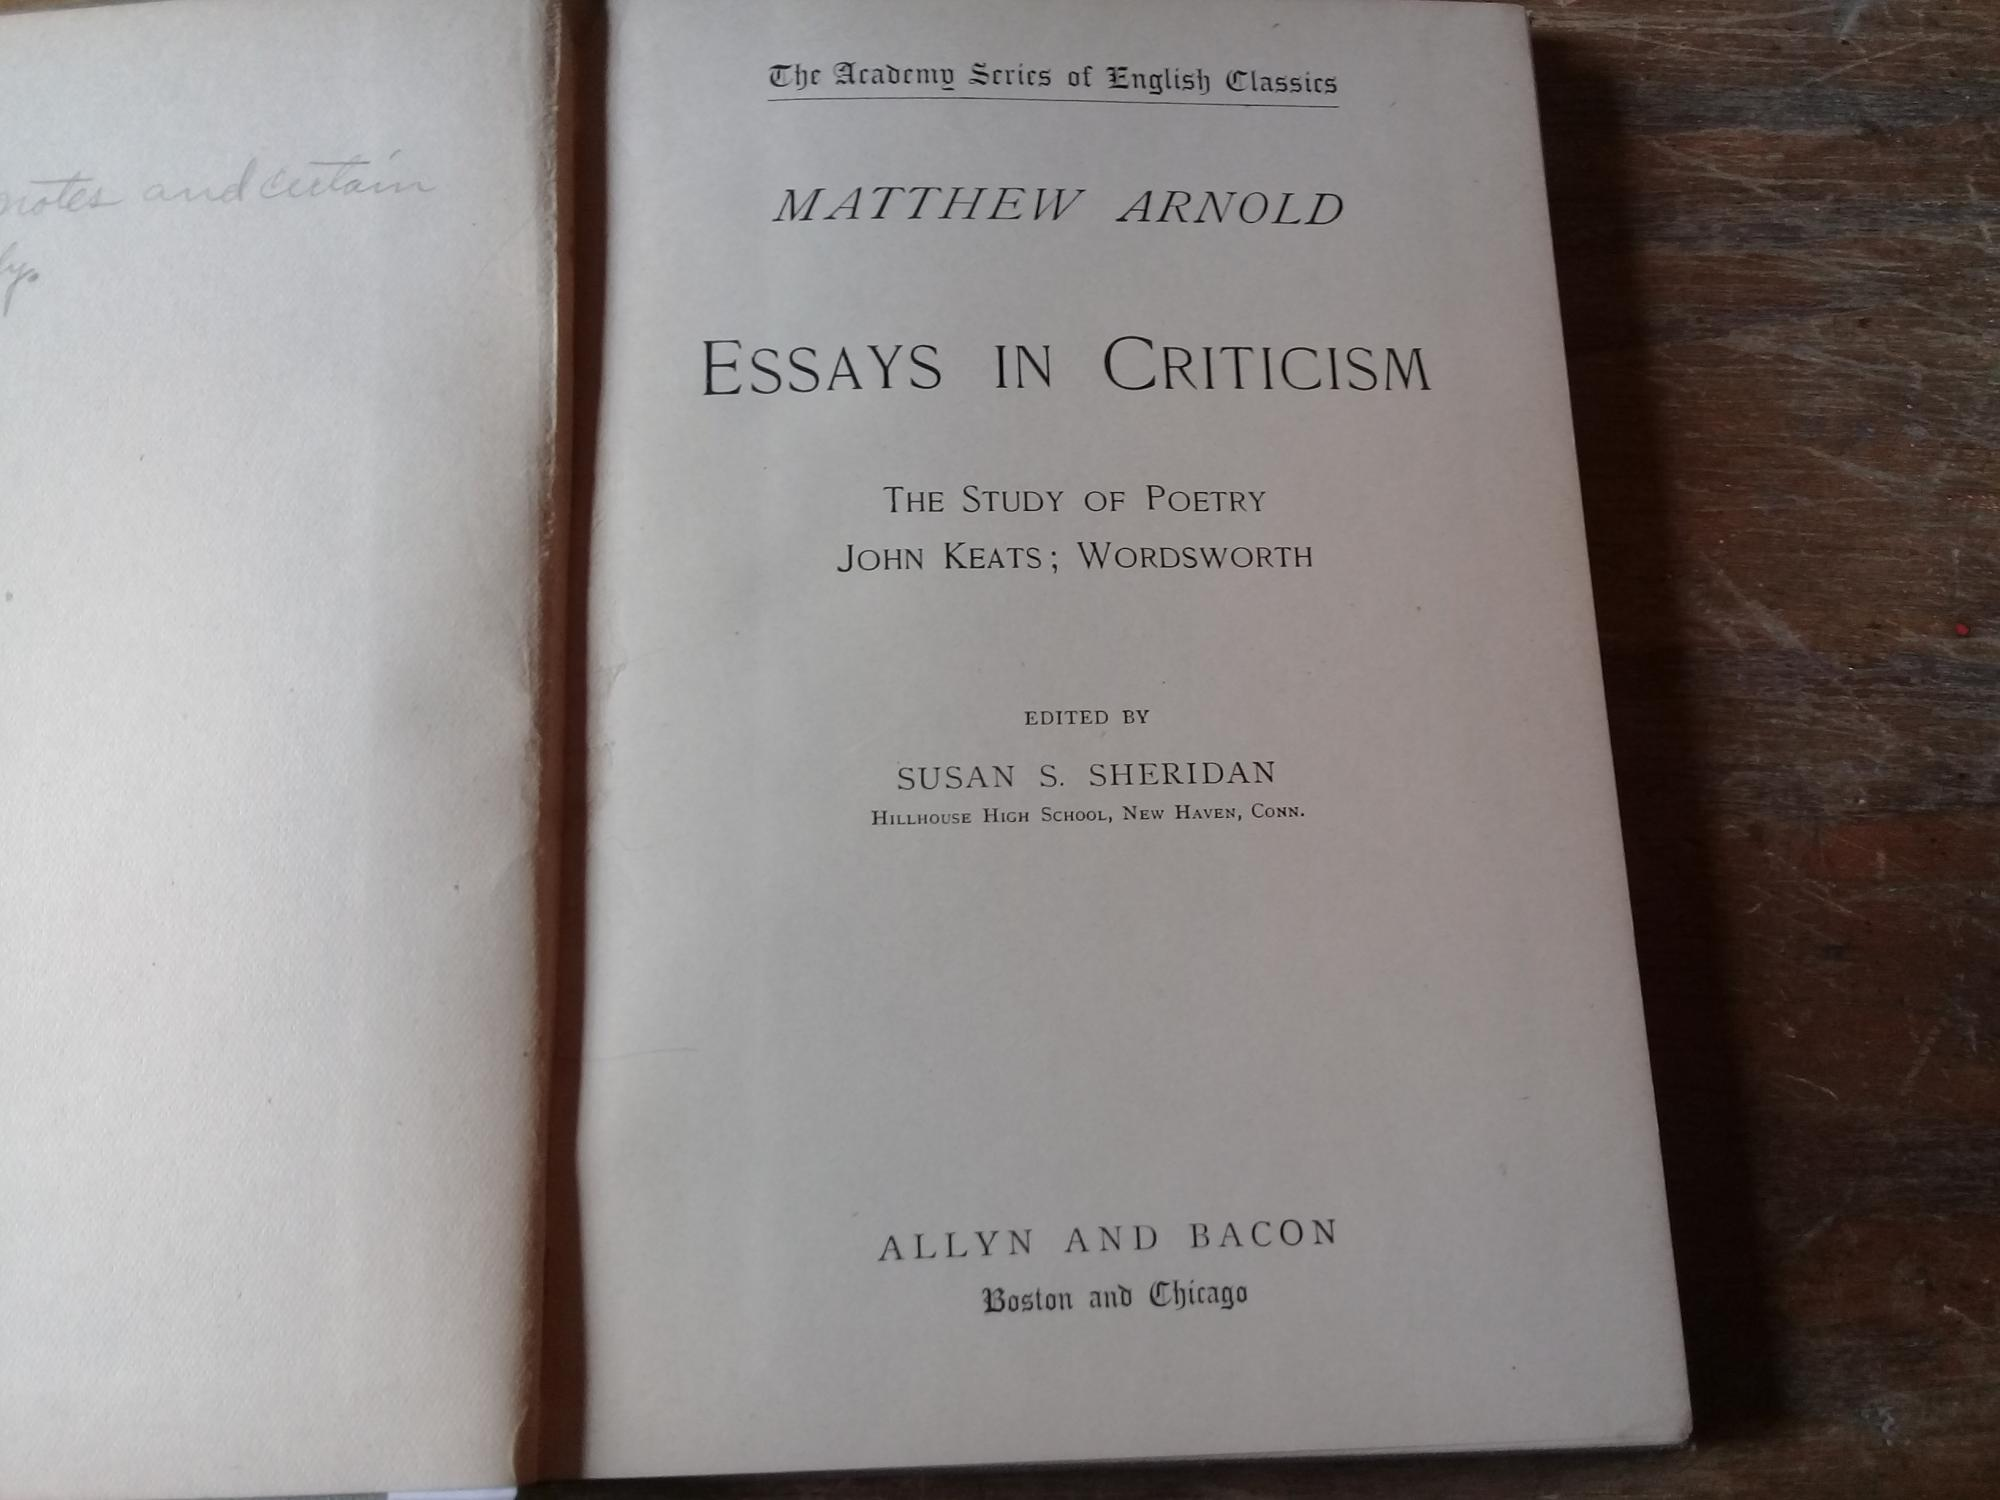 Matthew arnold essay on john keats help with  top resume online